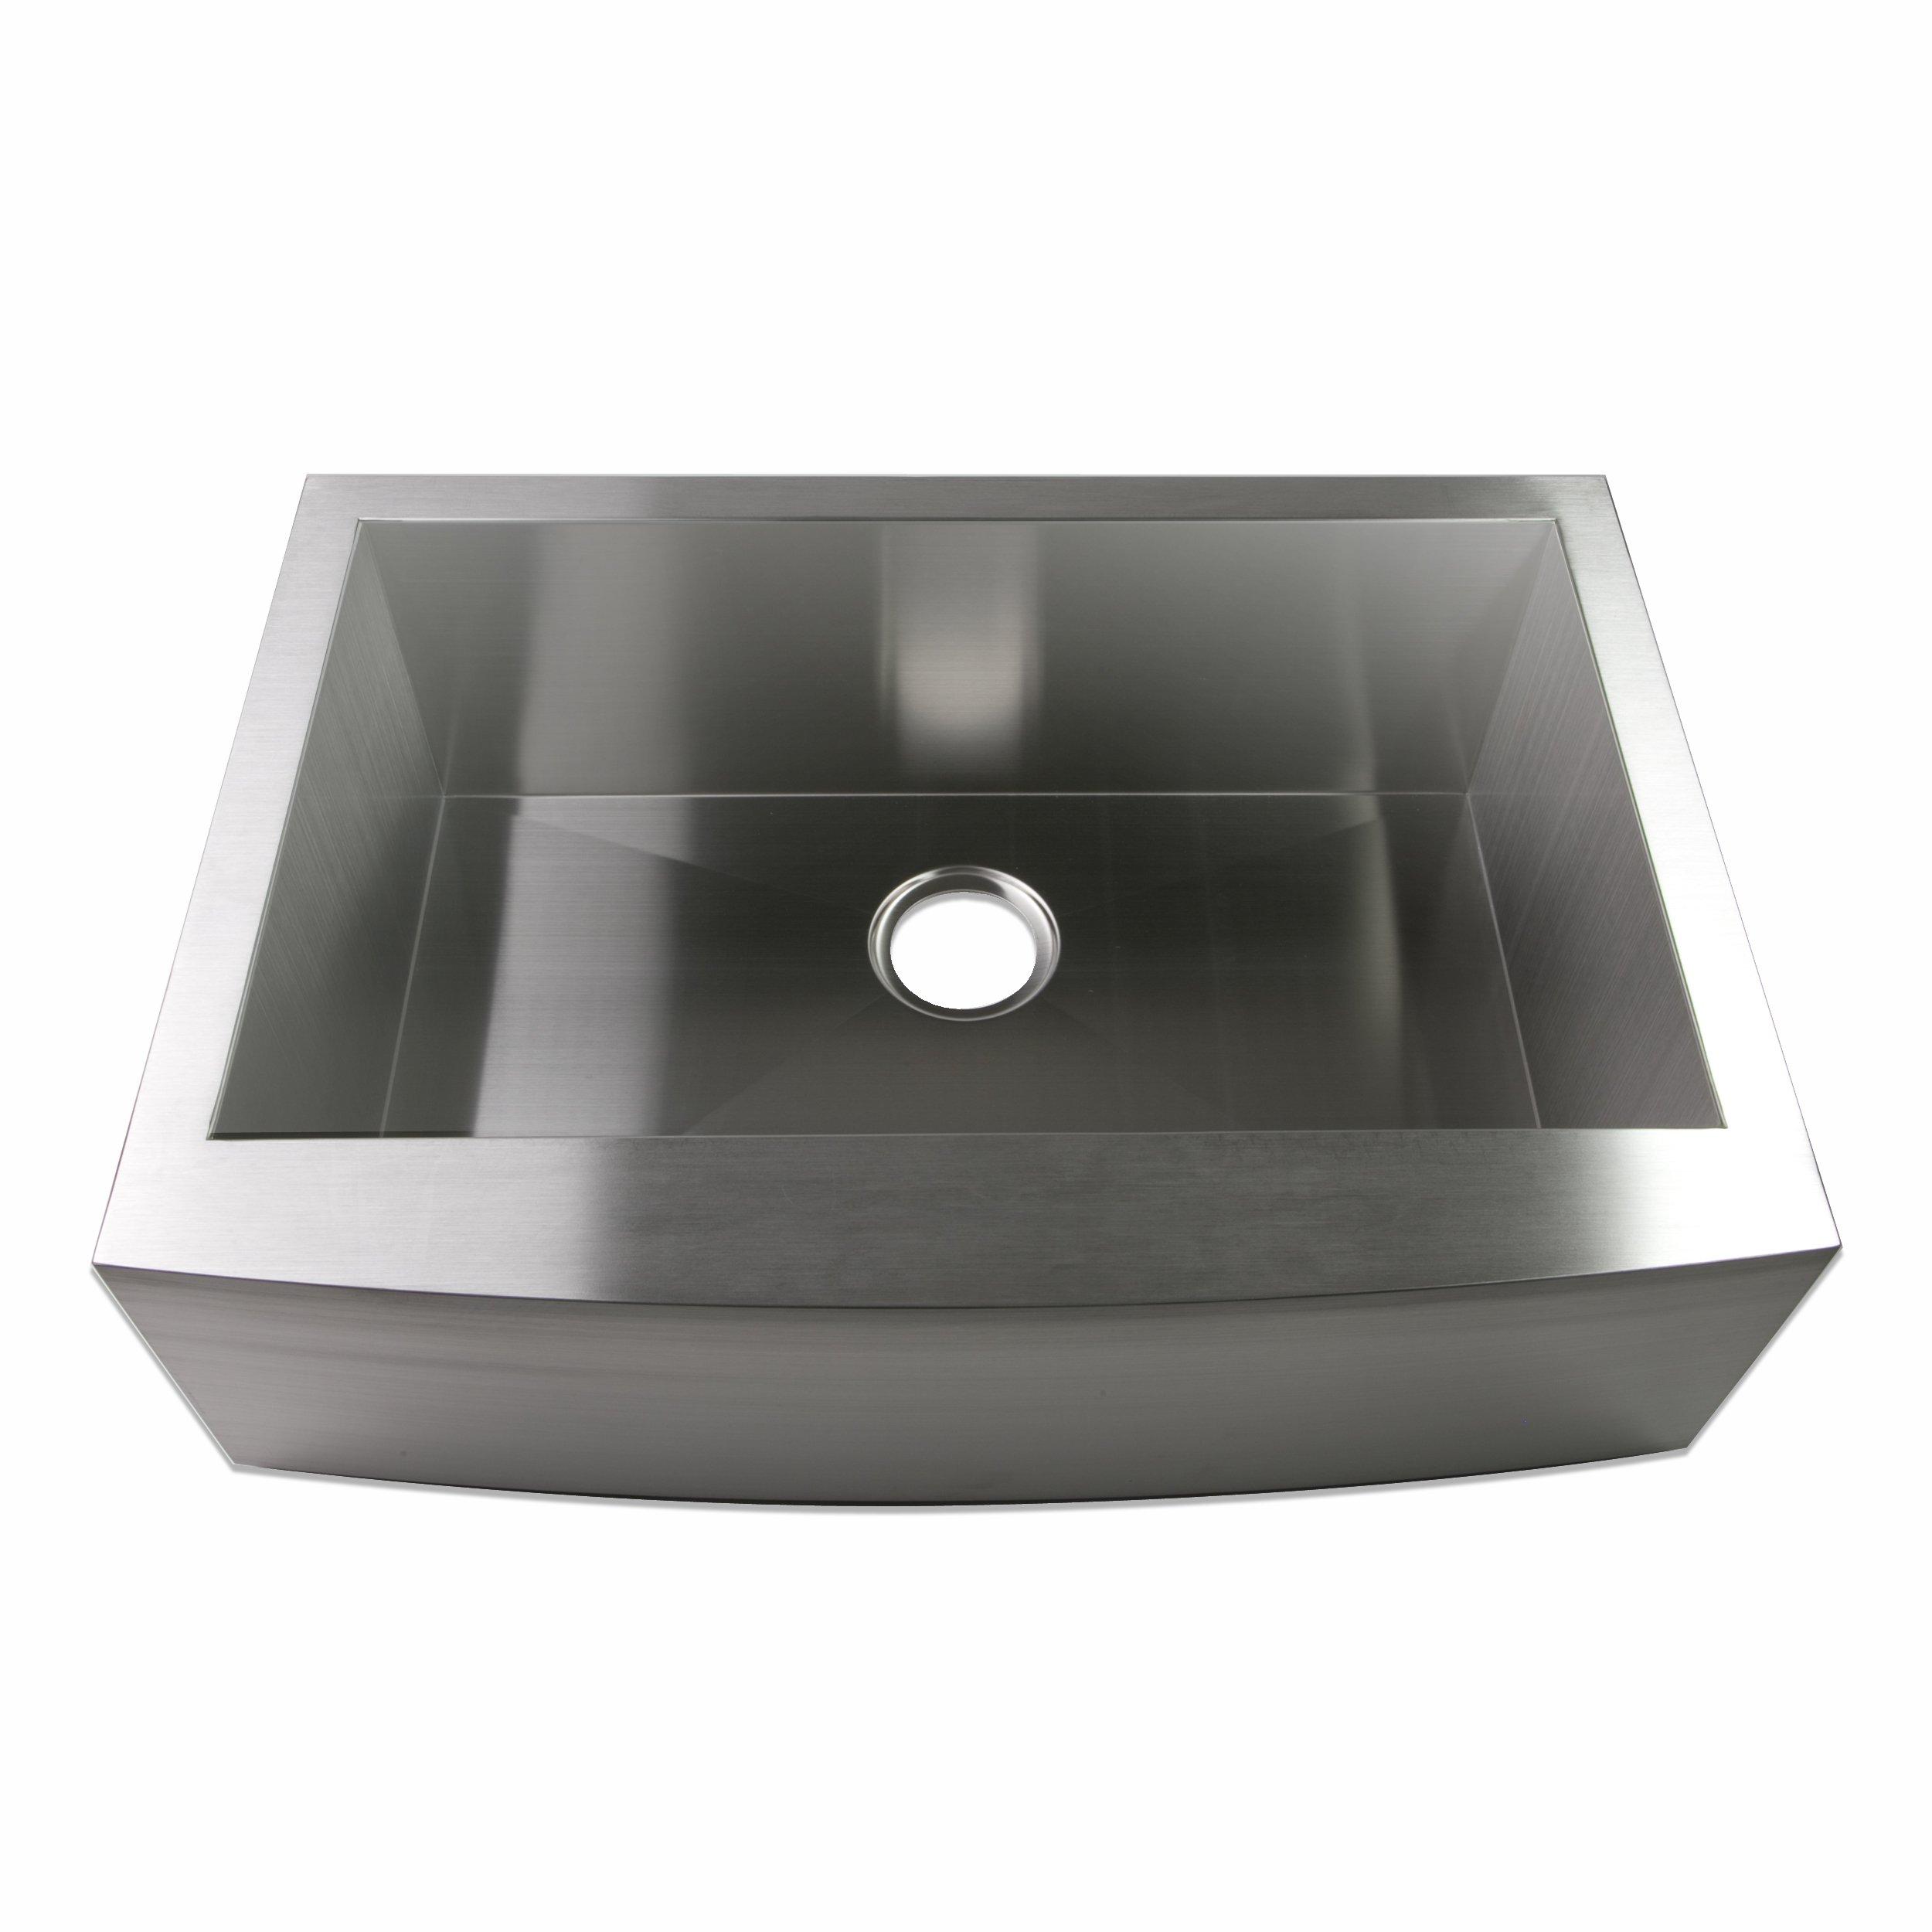 Luxier A001-Z 30 Inch x 21 Inch Farmhouse Apron Single Bowl 16 Gauge Stainless Steel Luxury Handmade Kitchen Sink cUPC Zero Radius